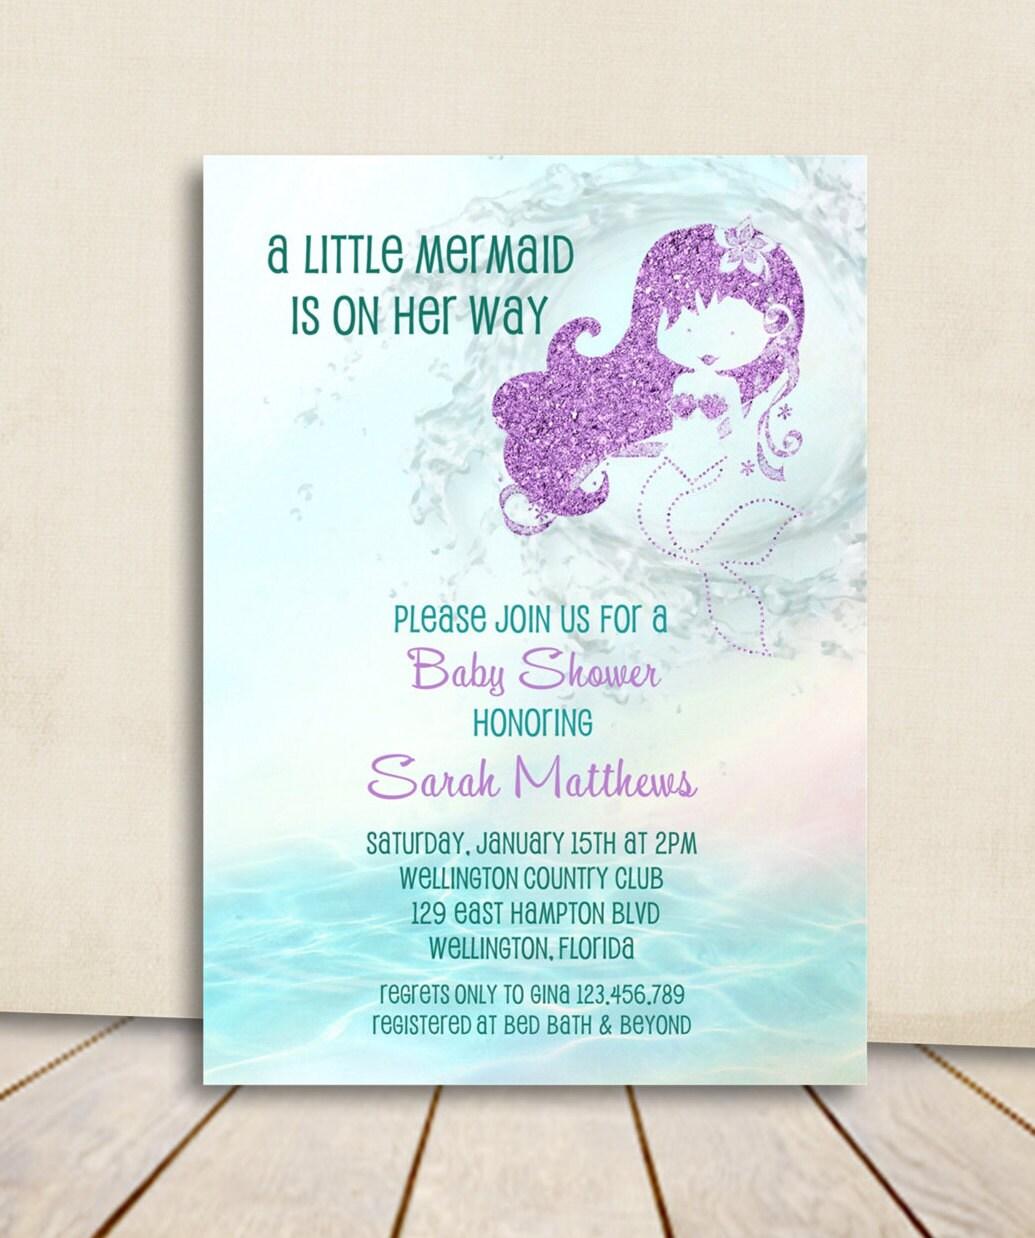 Mermaid Baby Shower Invitation Turquoise and Purple Glitter